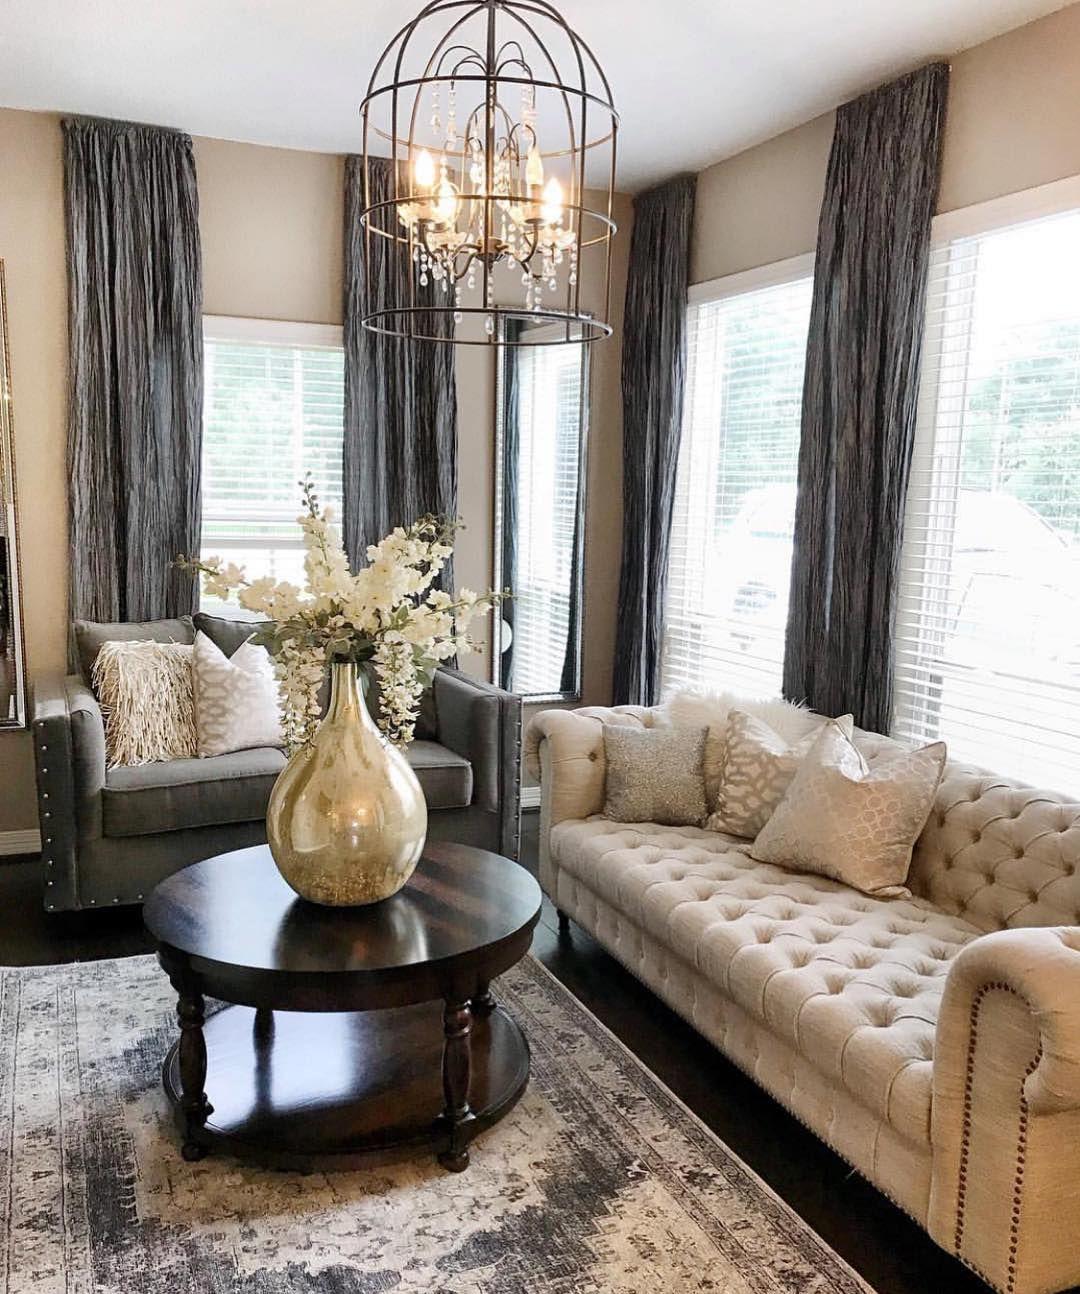 Top 10 Beegcom Best Furniture Brands In China Home Decor Home Decor Sites Home Decor Shops